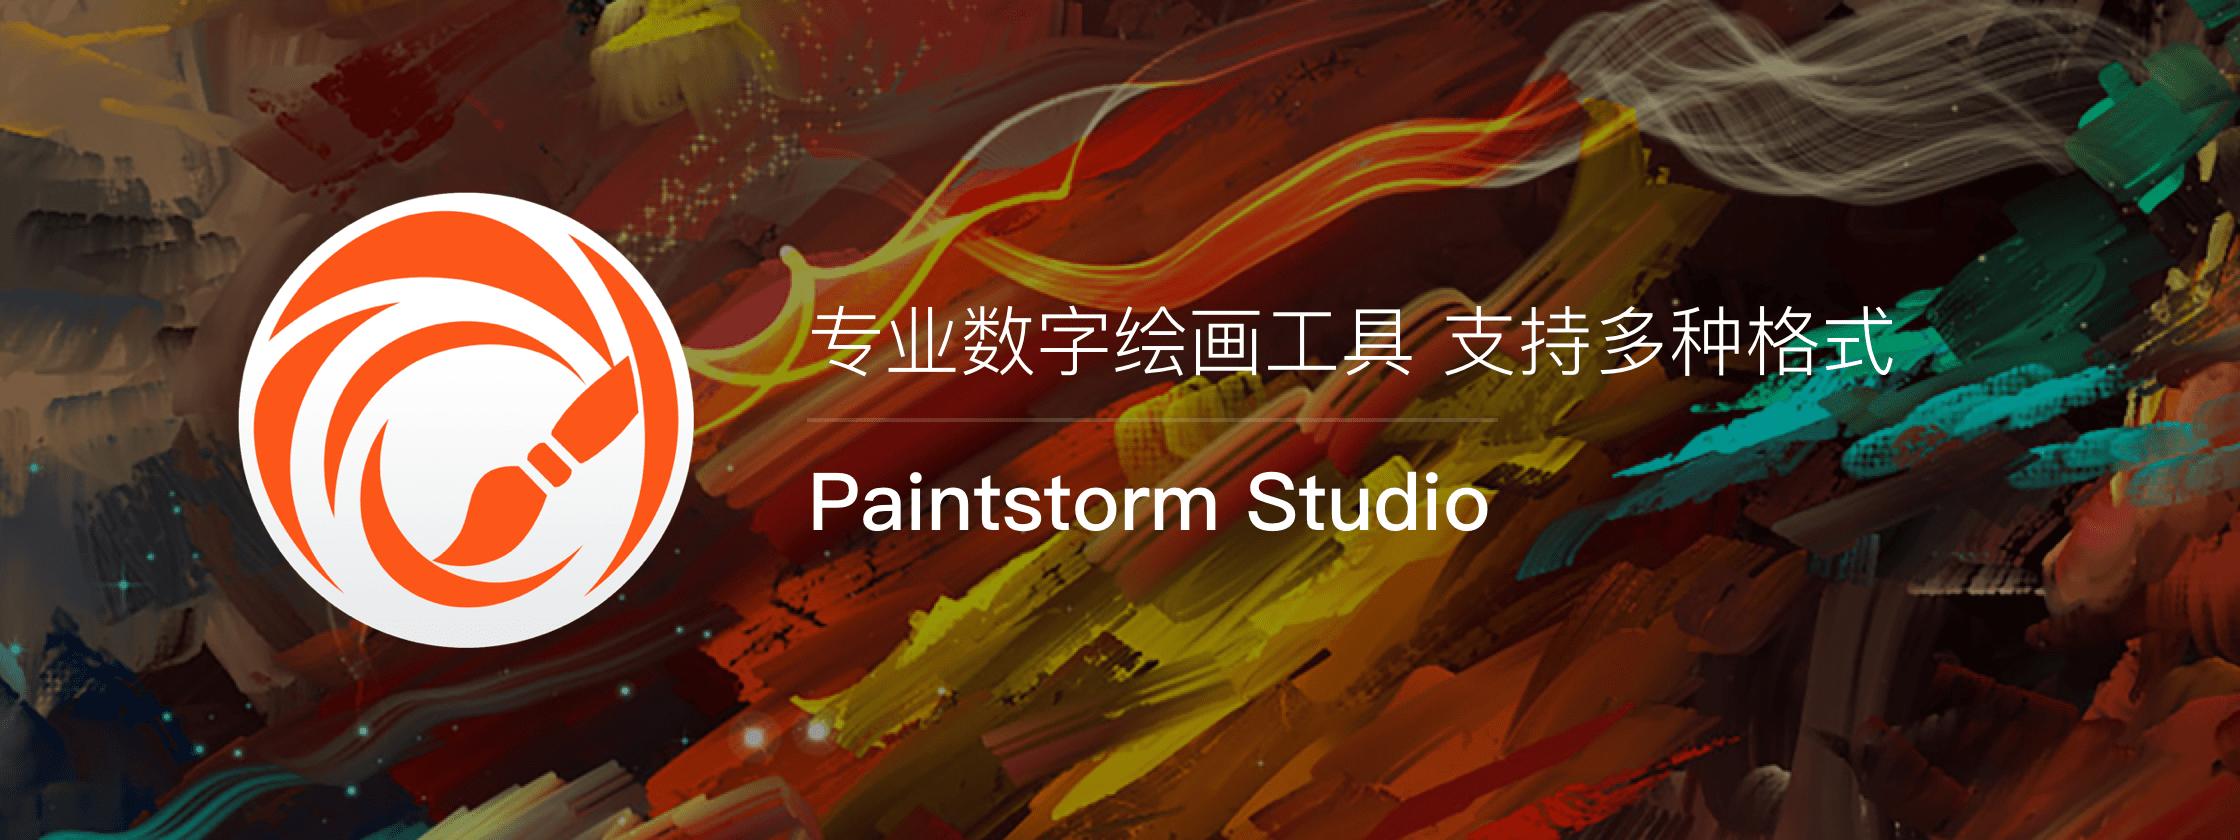 Paintstrom Studio,专业级数字绘画工具